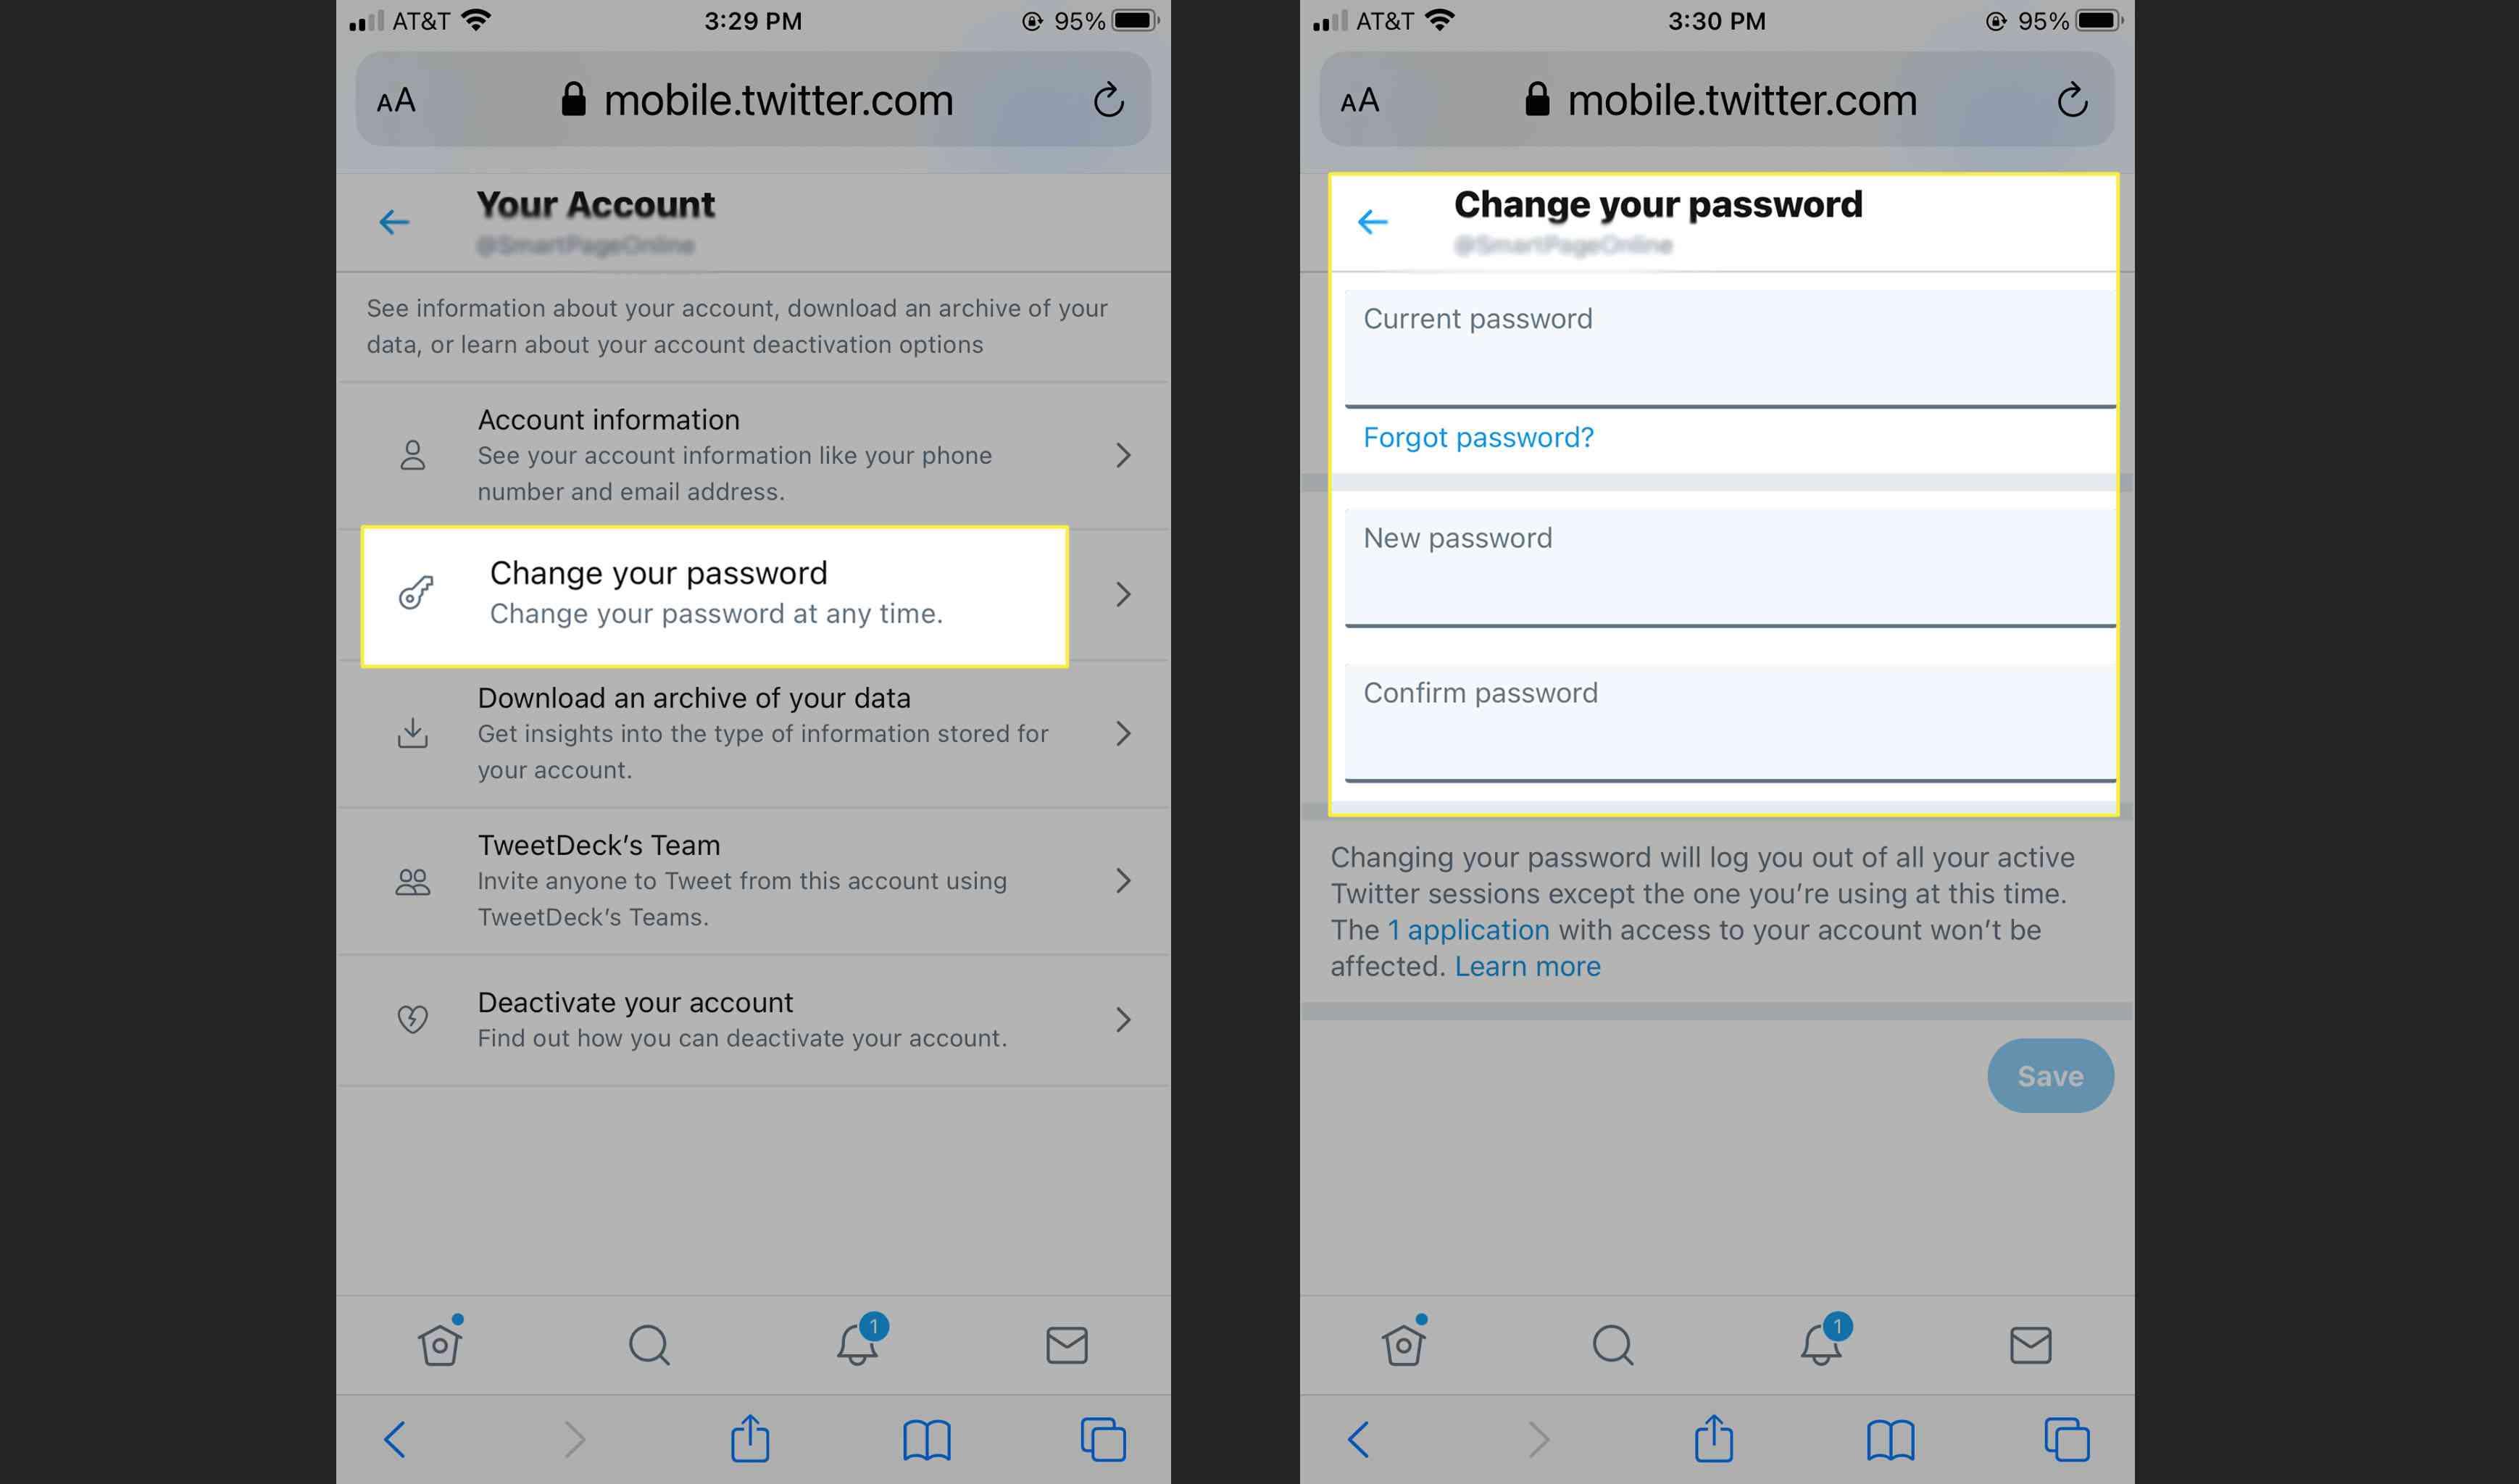 Twitter - change password on mobile website